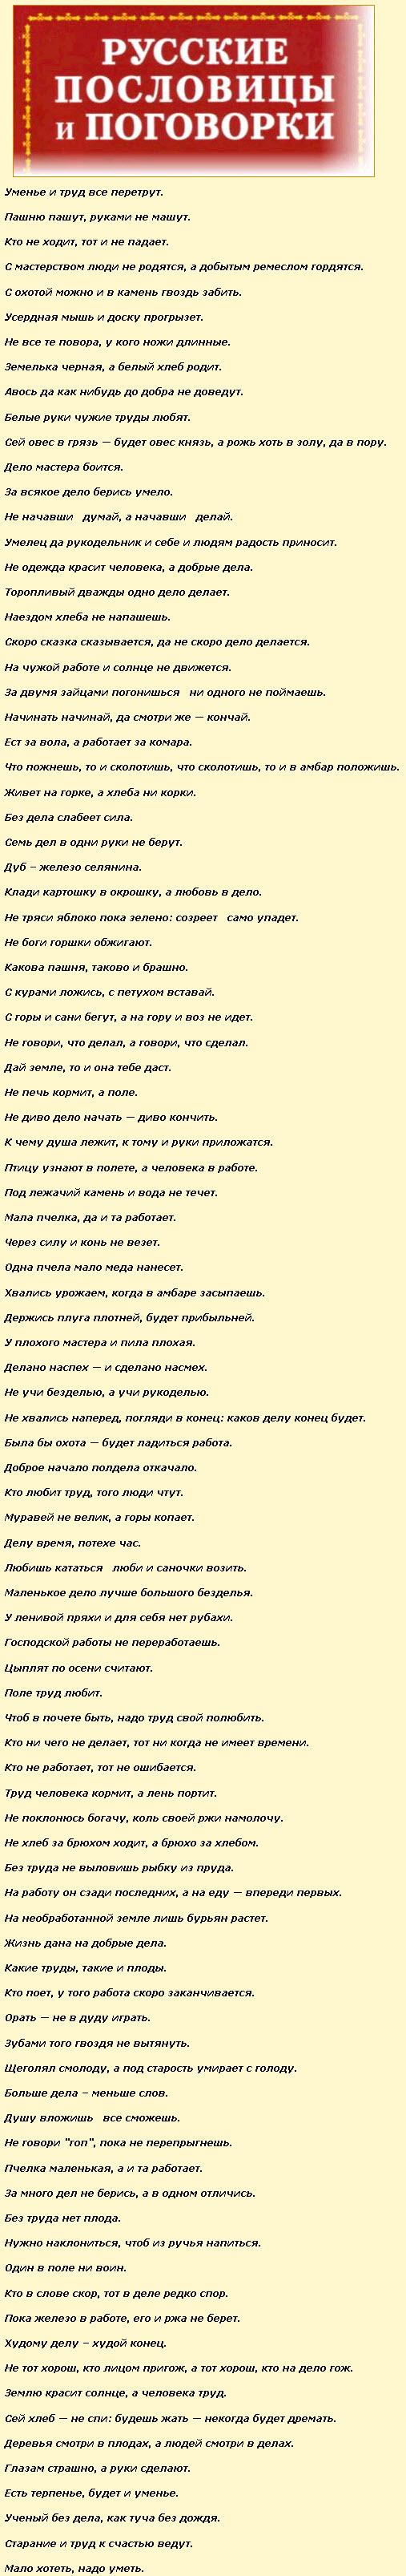 Пословицы о птицах на русском языке